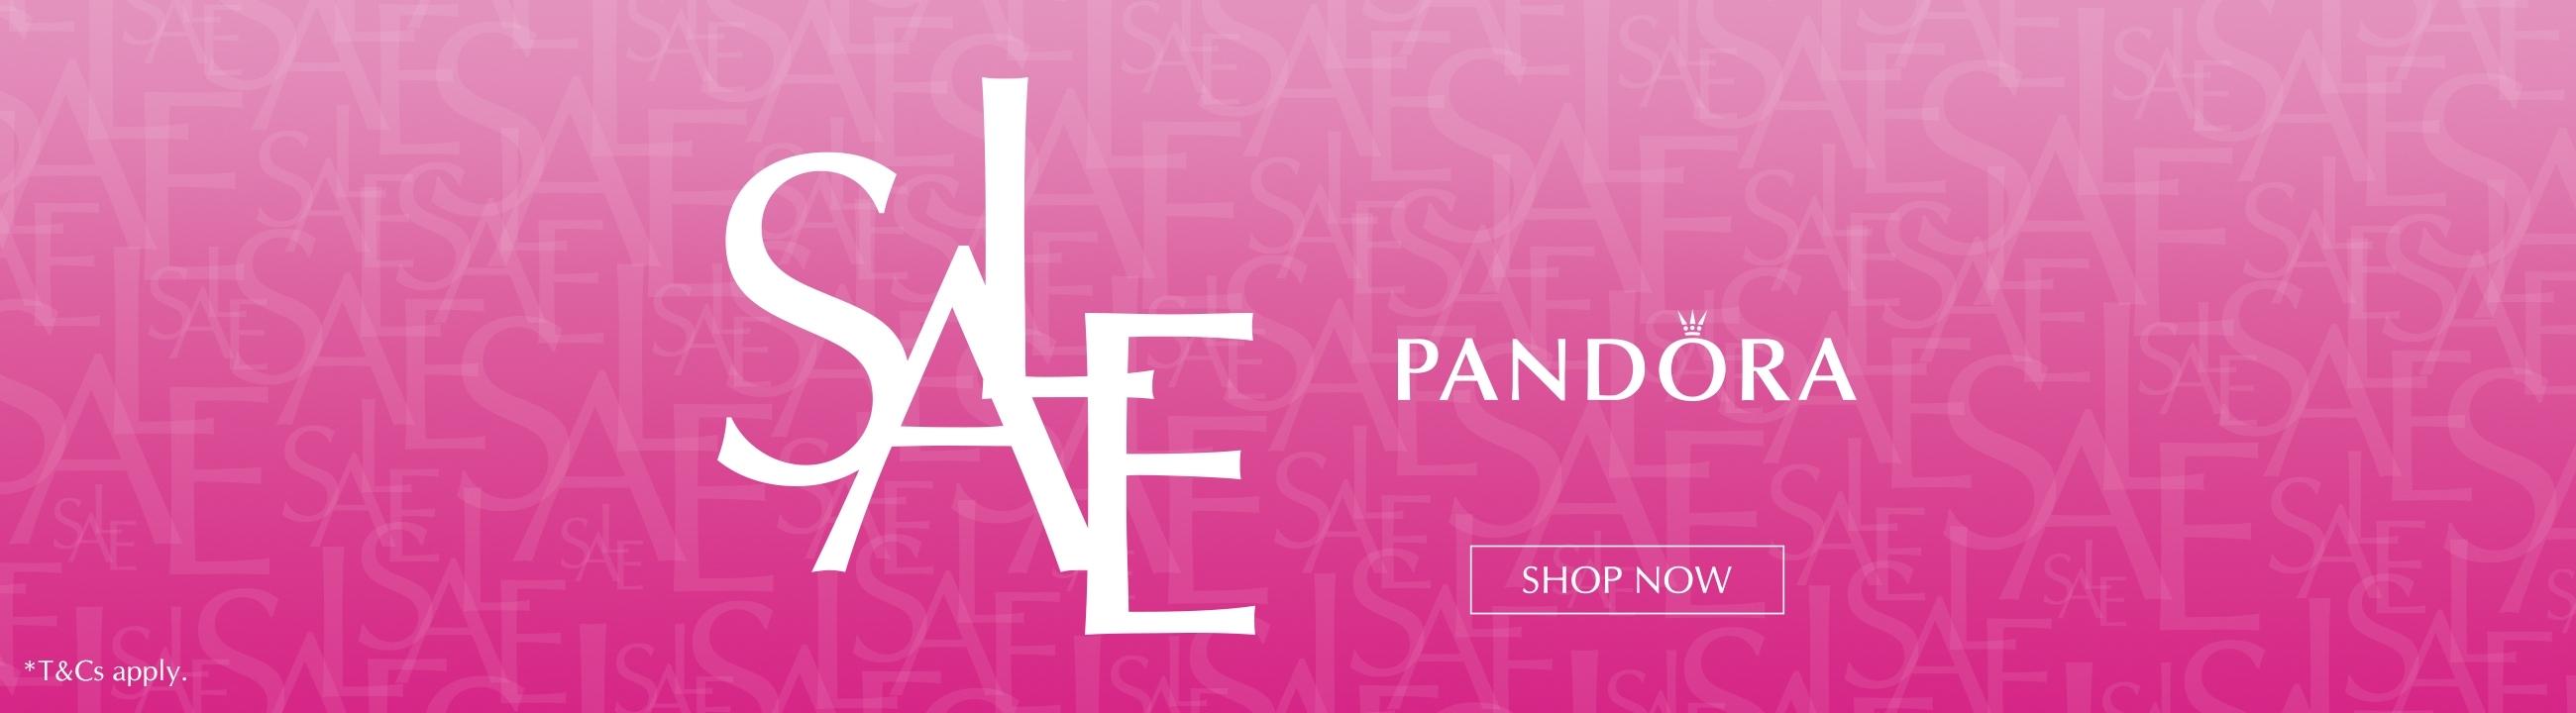 John Greed Jewellery: Sale up to 60% off Pandora jewellery